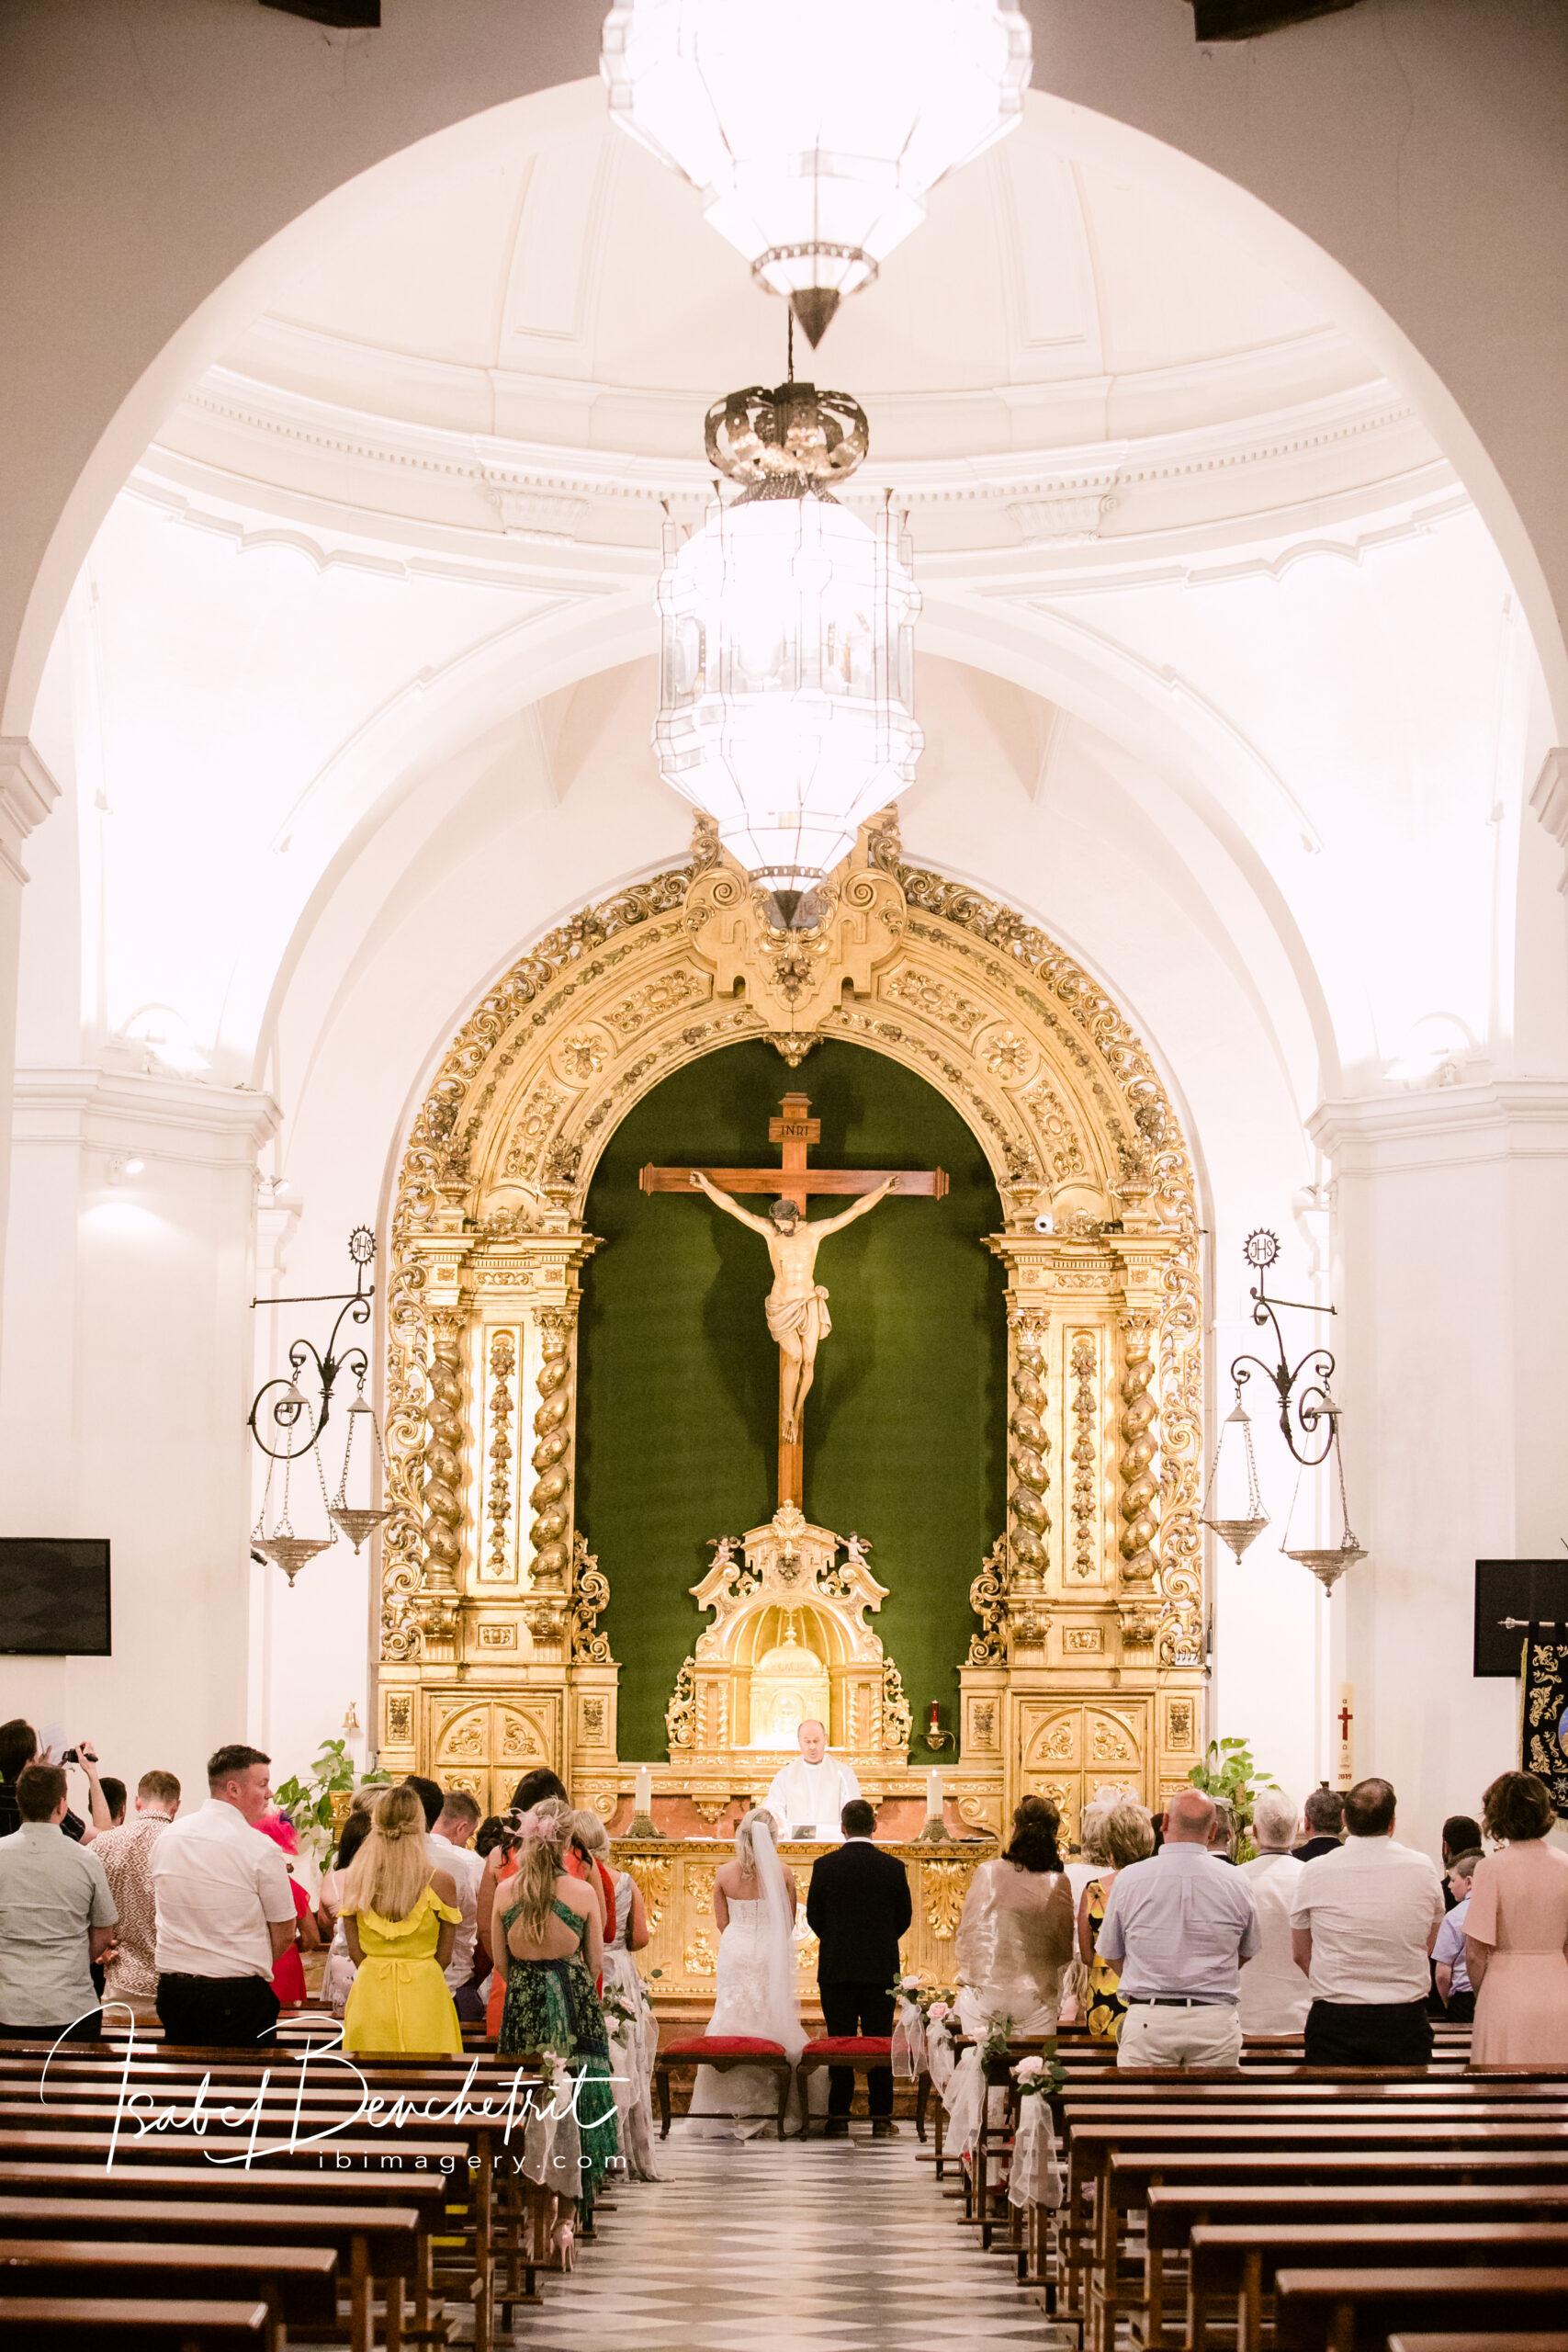 The wedding ceremony inside the beautiful church near the venue